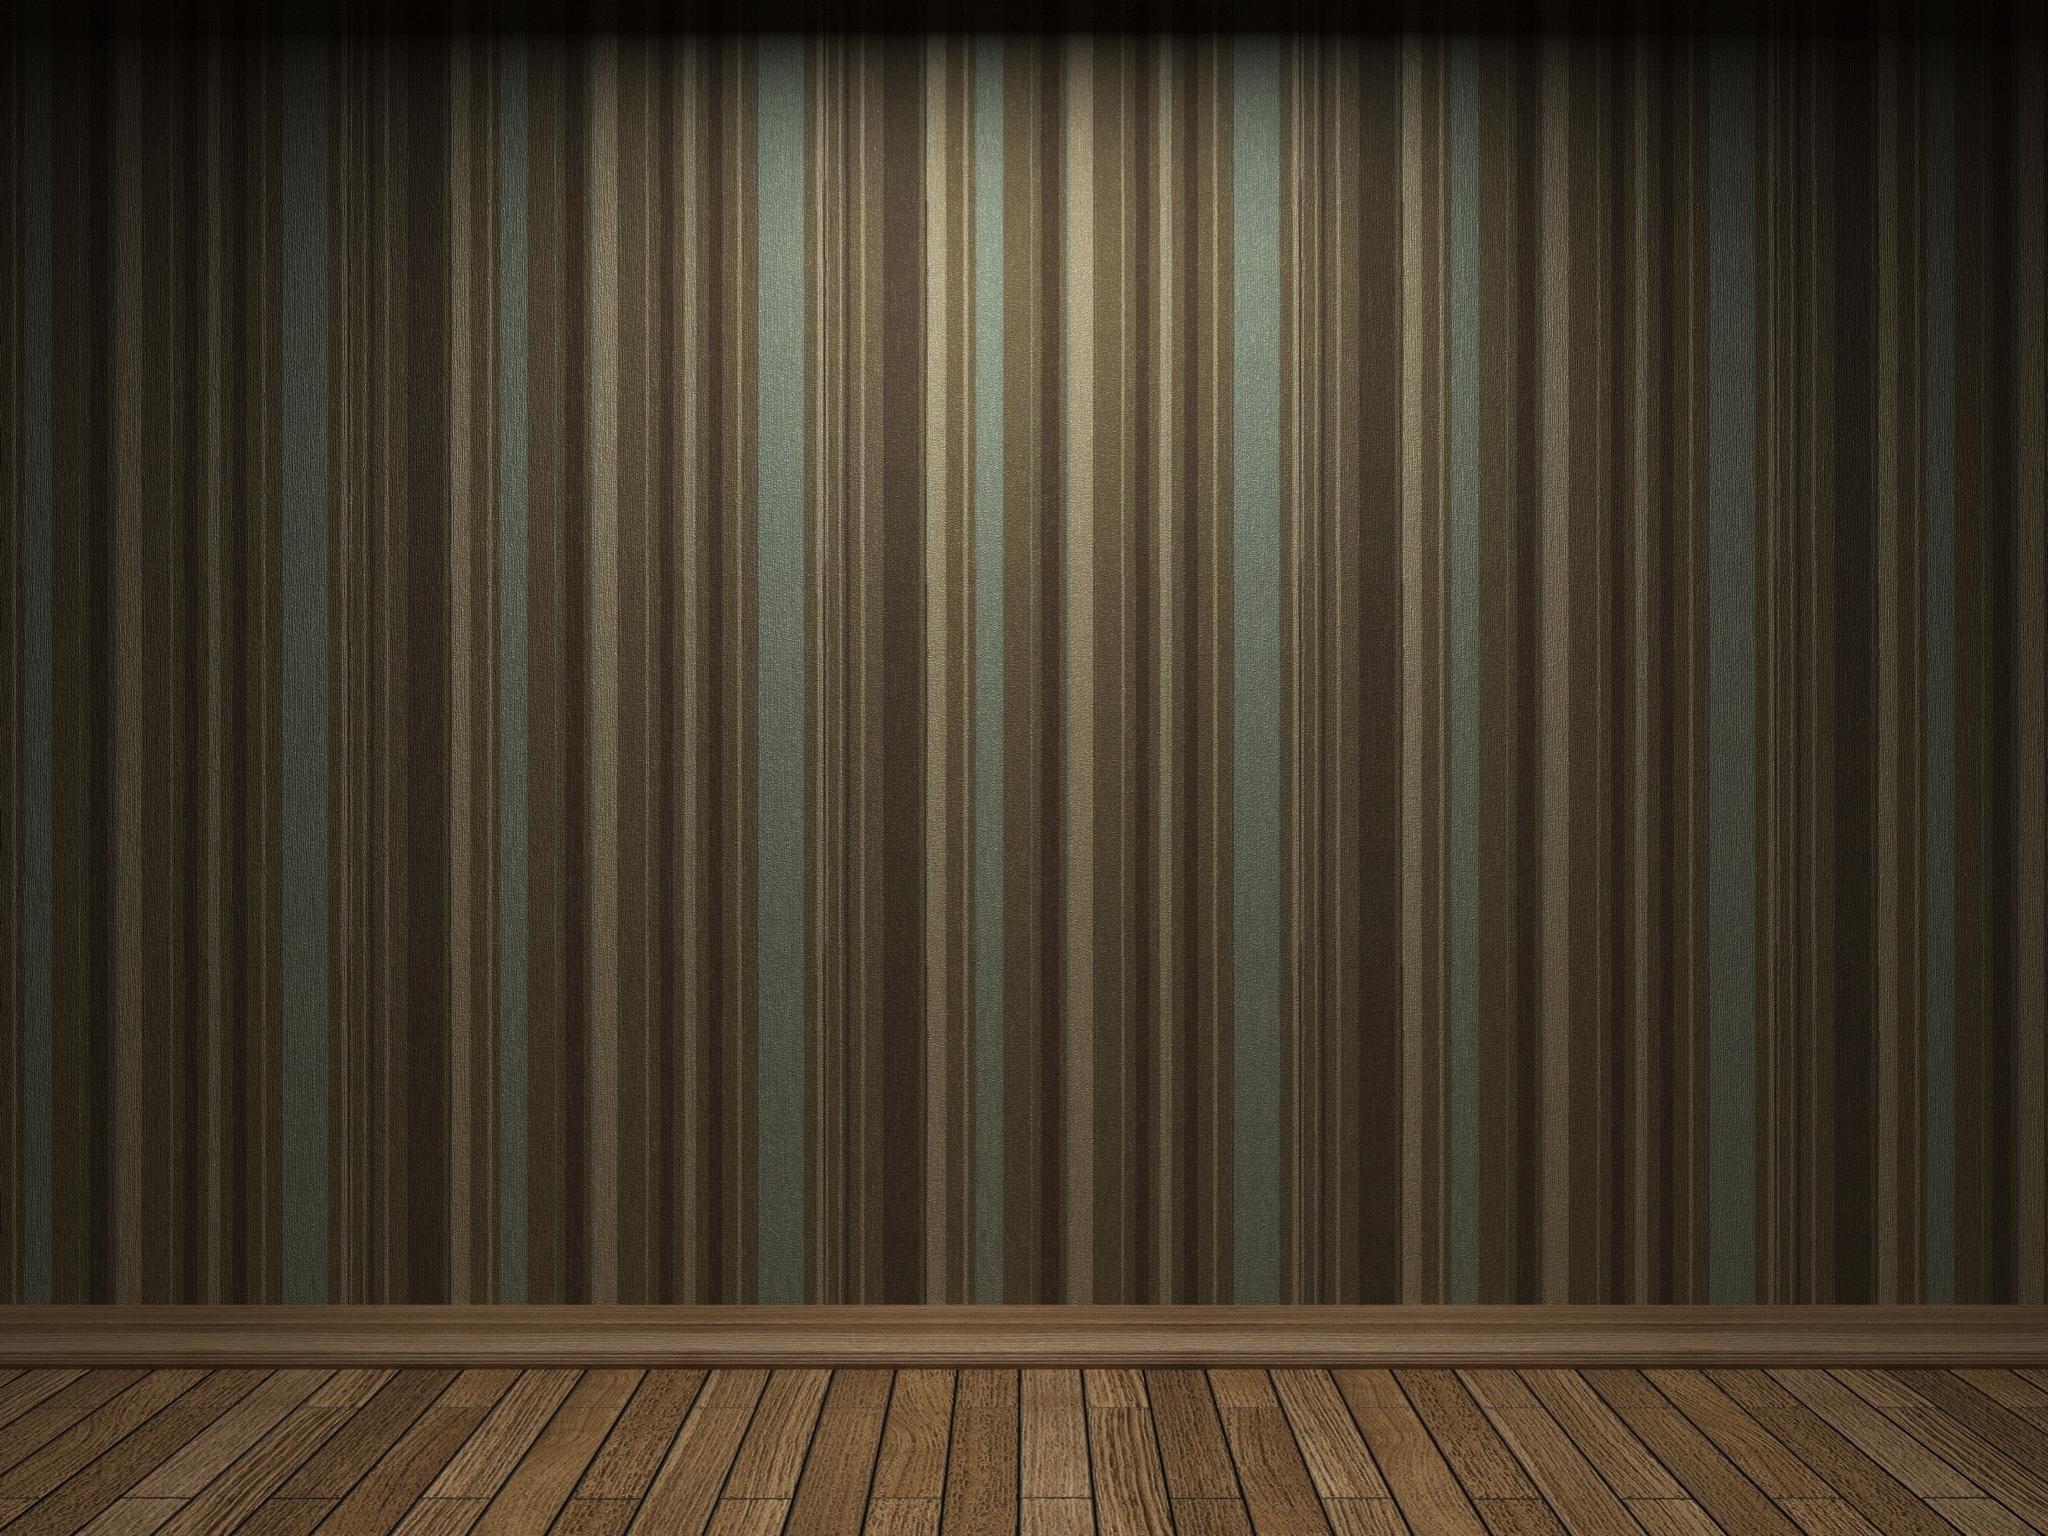 Elegant wall design   Designs Wallpaper 22687133   Page 3 2048x1536